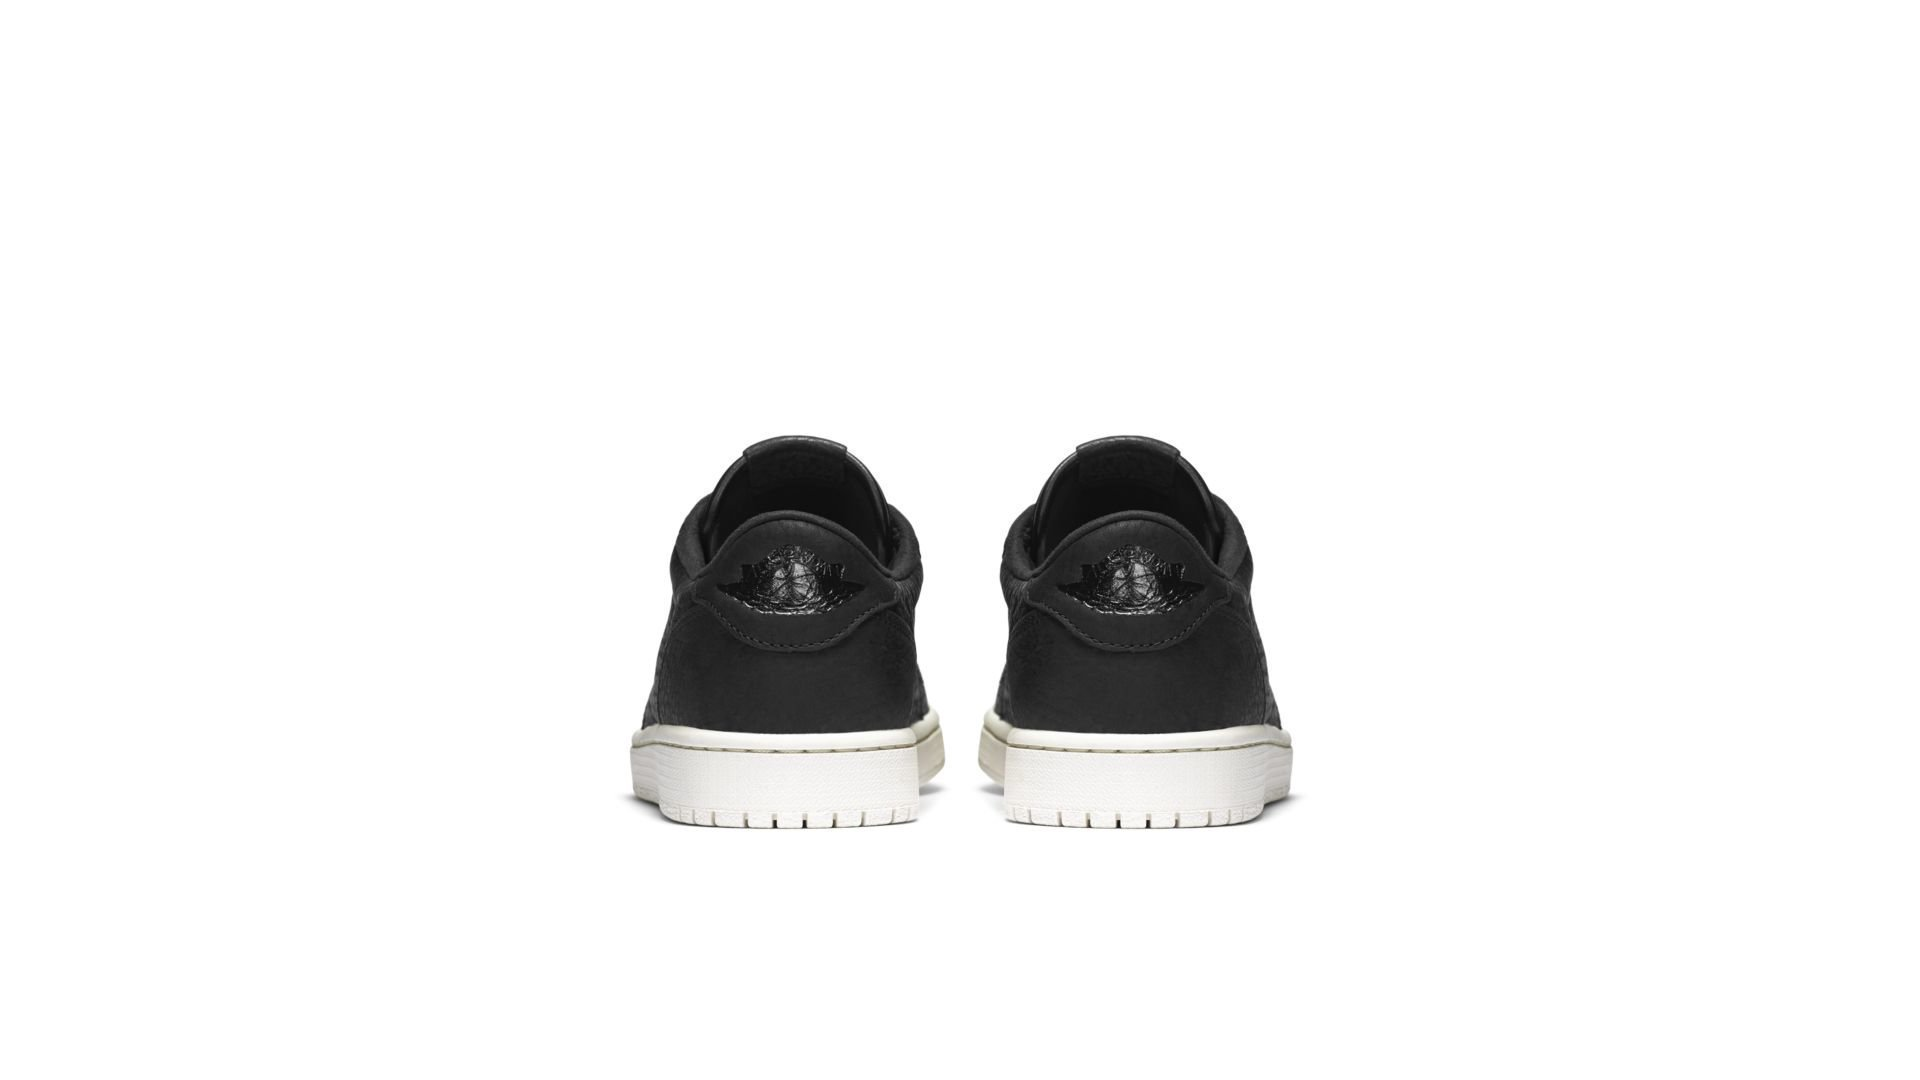 Jordan 1 Retro Low Swooshless Black (848775-005)